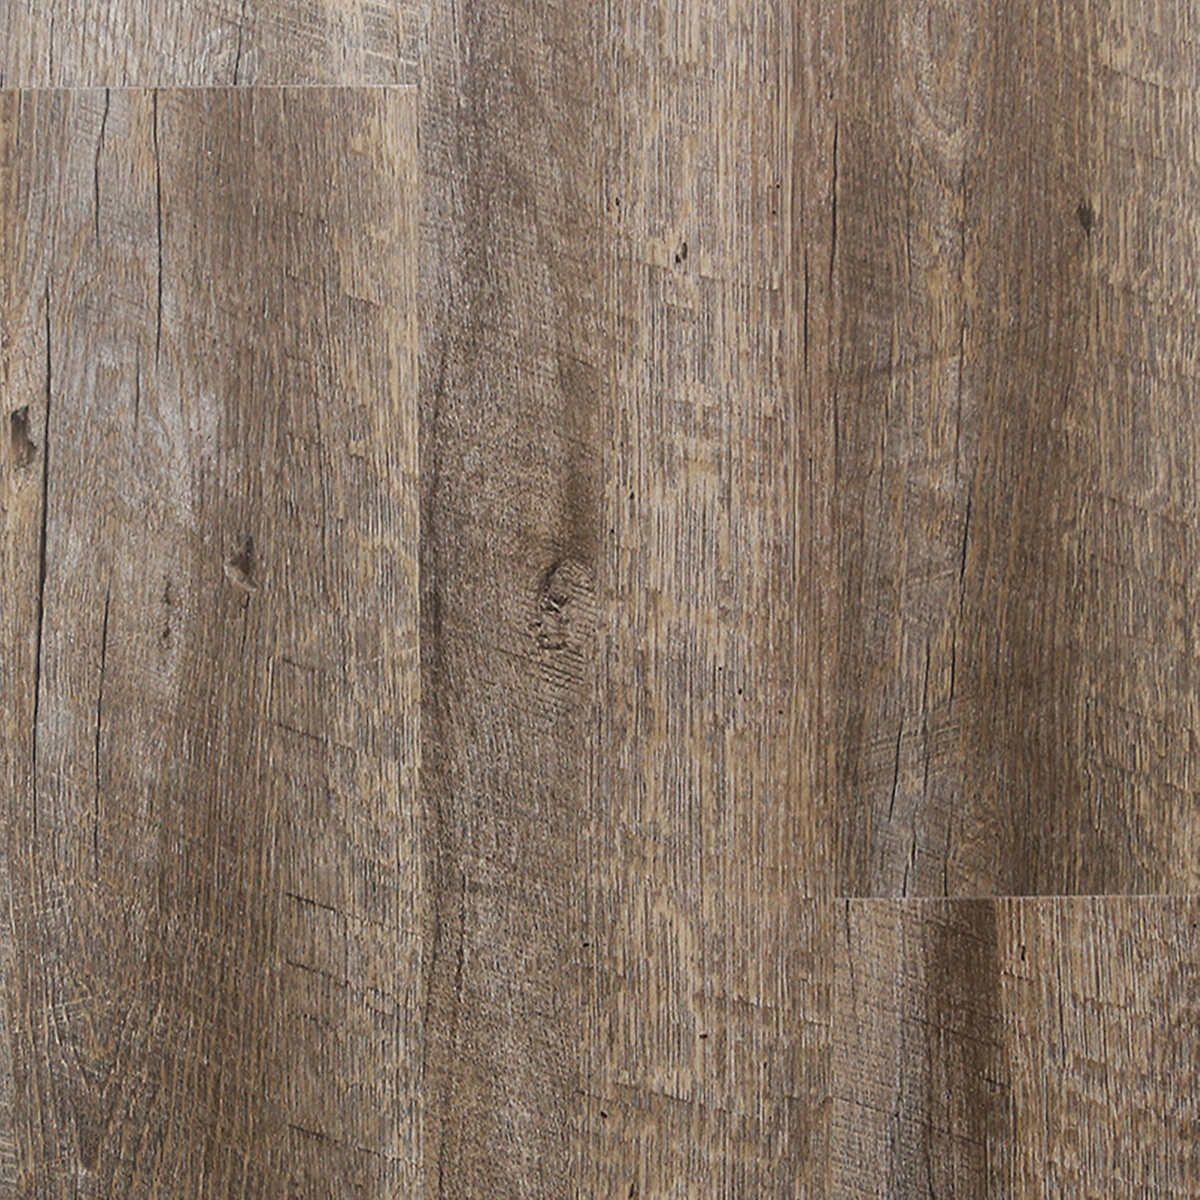 Golden Arowana Sandalwood HDPC Waterproof Plank Flooring